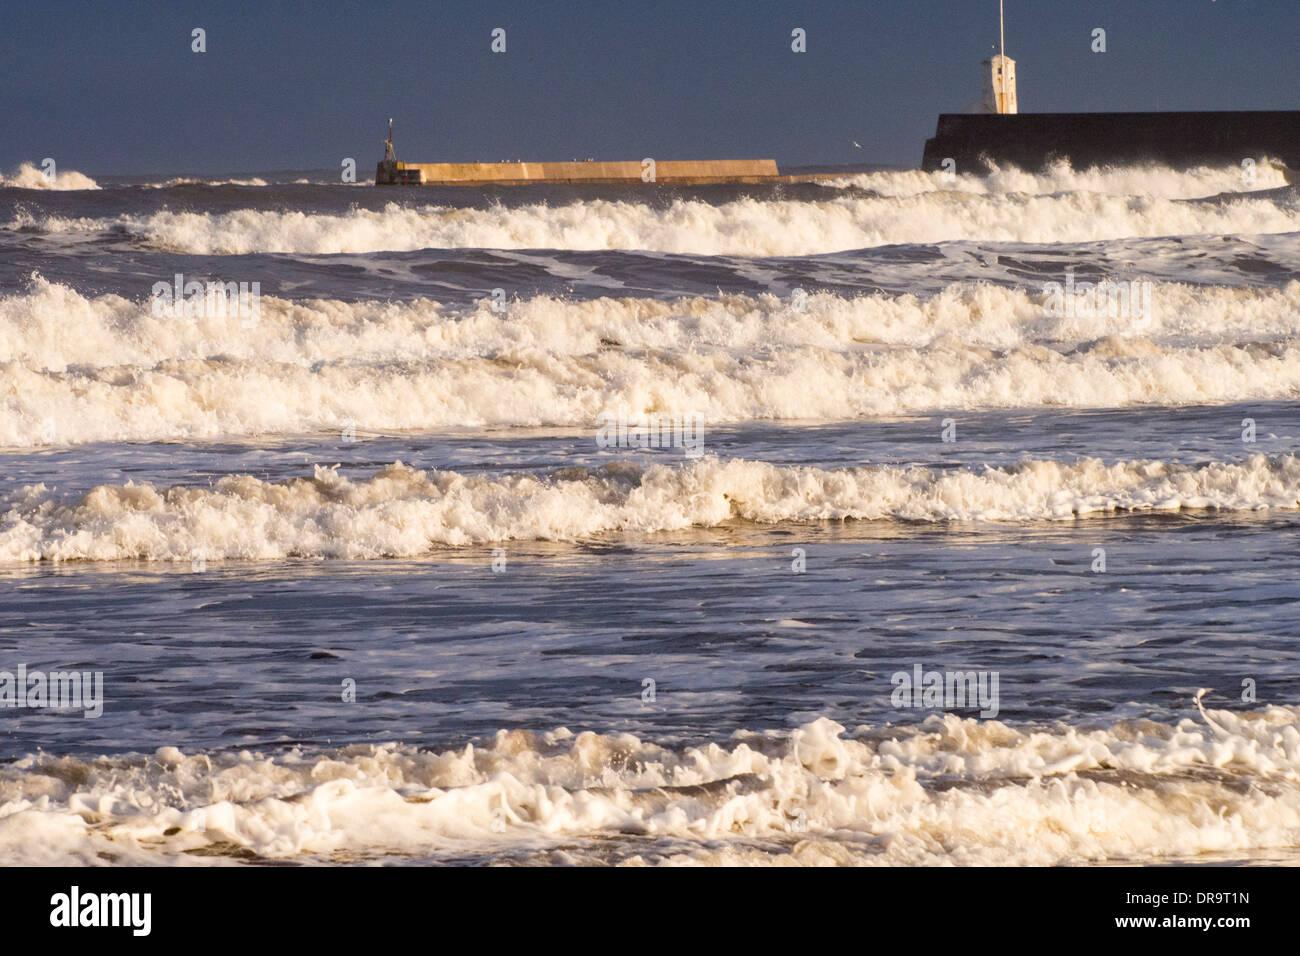 Waves hitting the Northumberland coast at Seahouses. - Stock Image